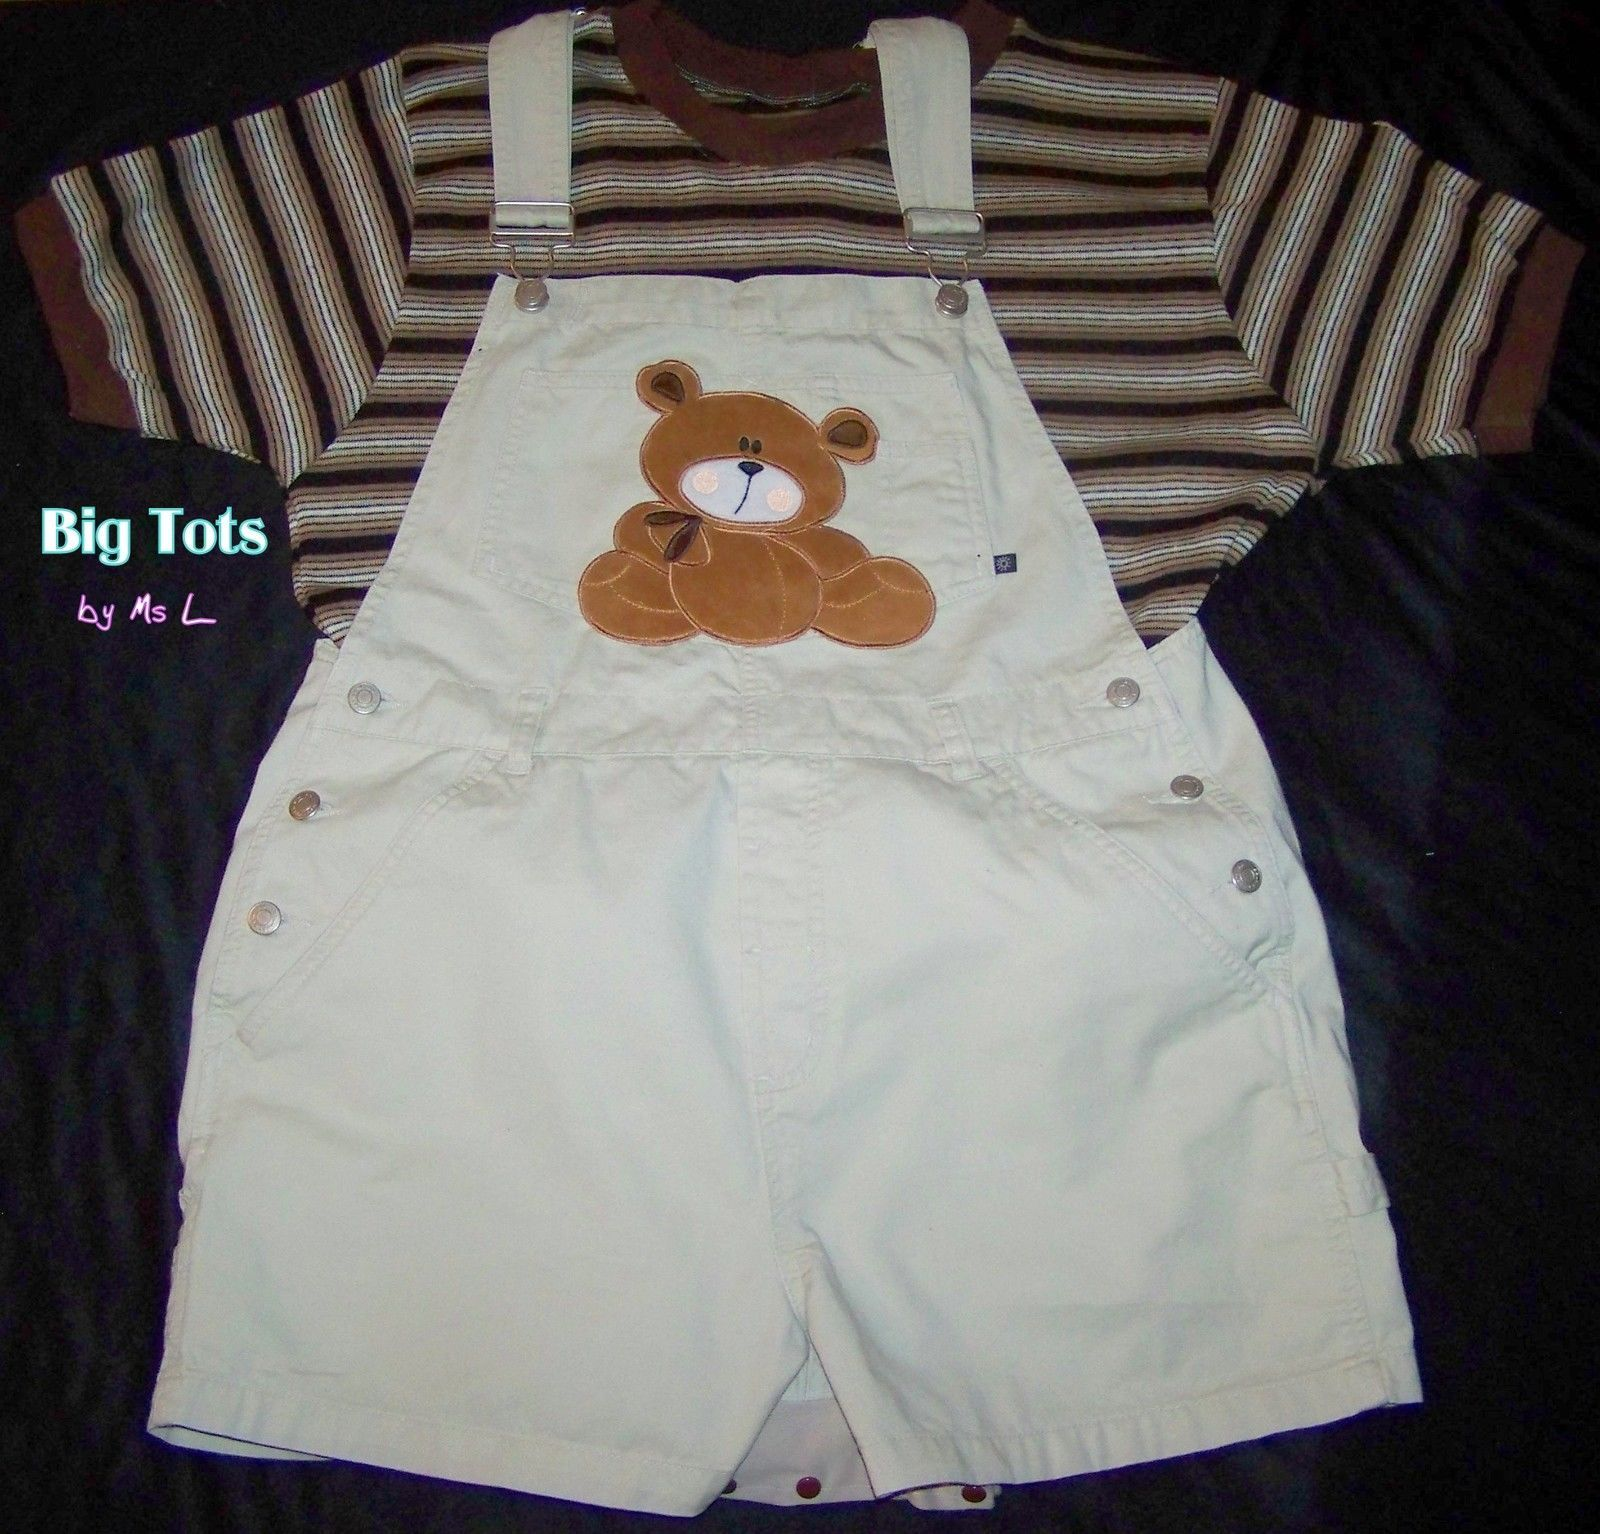 "Adult Baby Teddy Bear Shortalls Onesuit Set 46"" Hip MSL Big Tots | eBay"